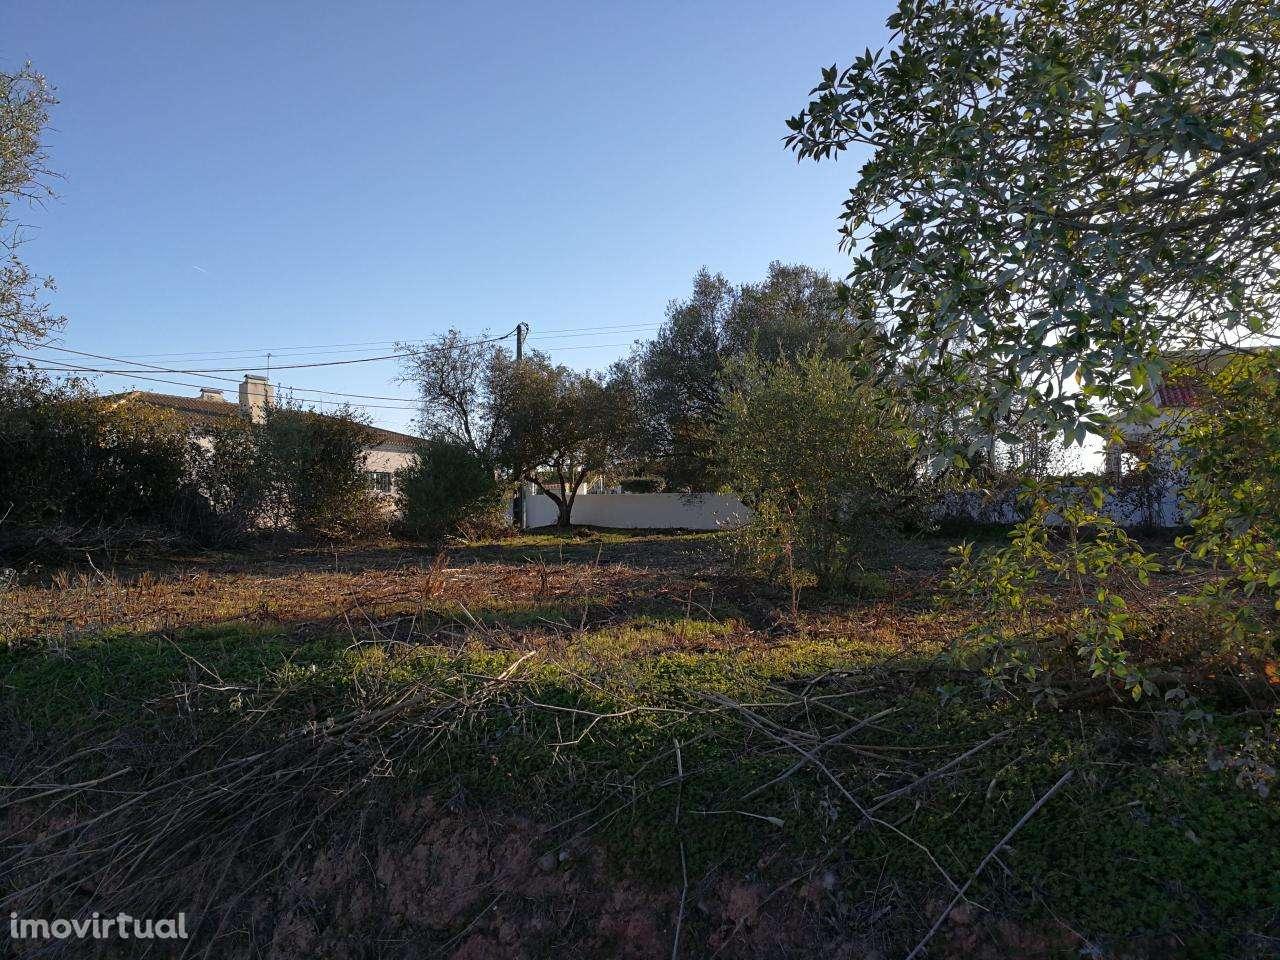 Terreno para comprar, Castelo (Sesimbra), Sesimbra, Setúbal - Foto 3